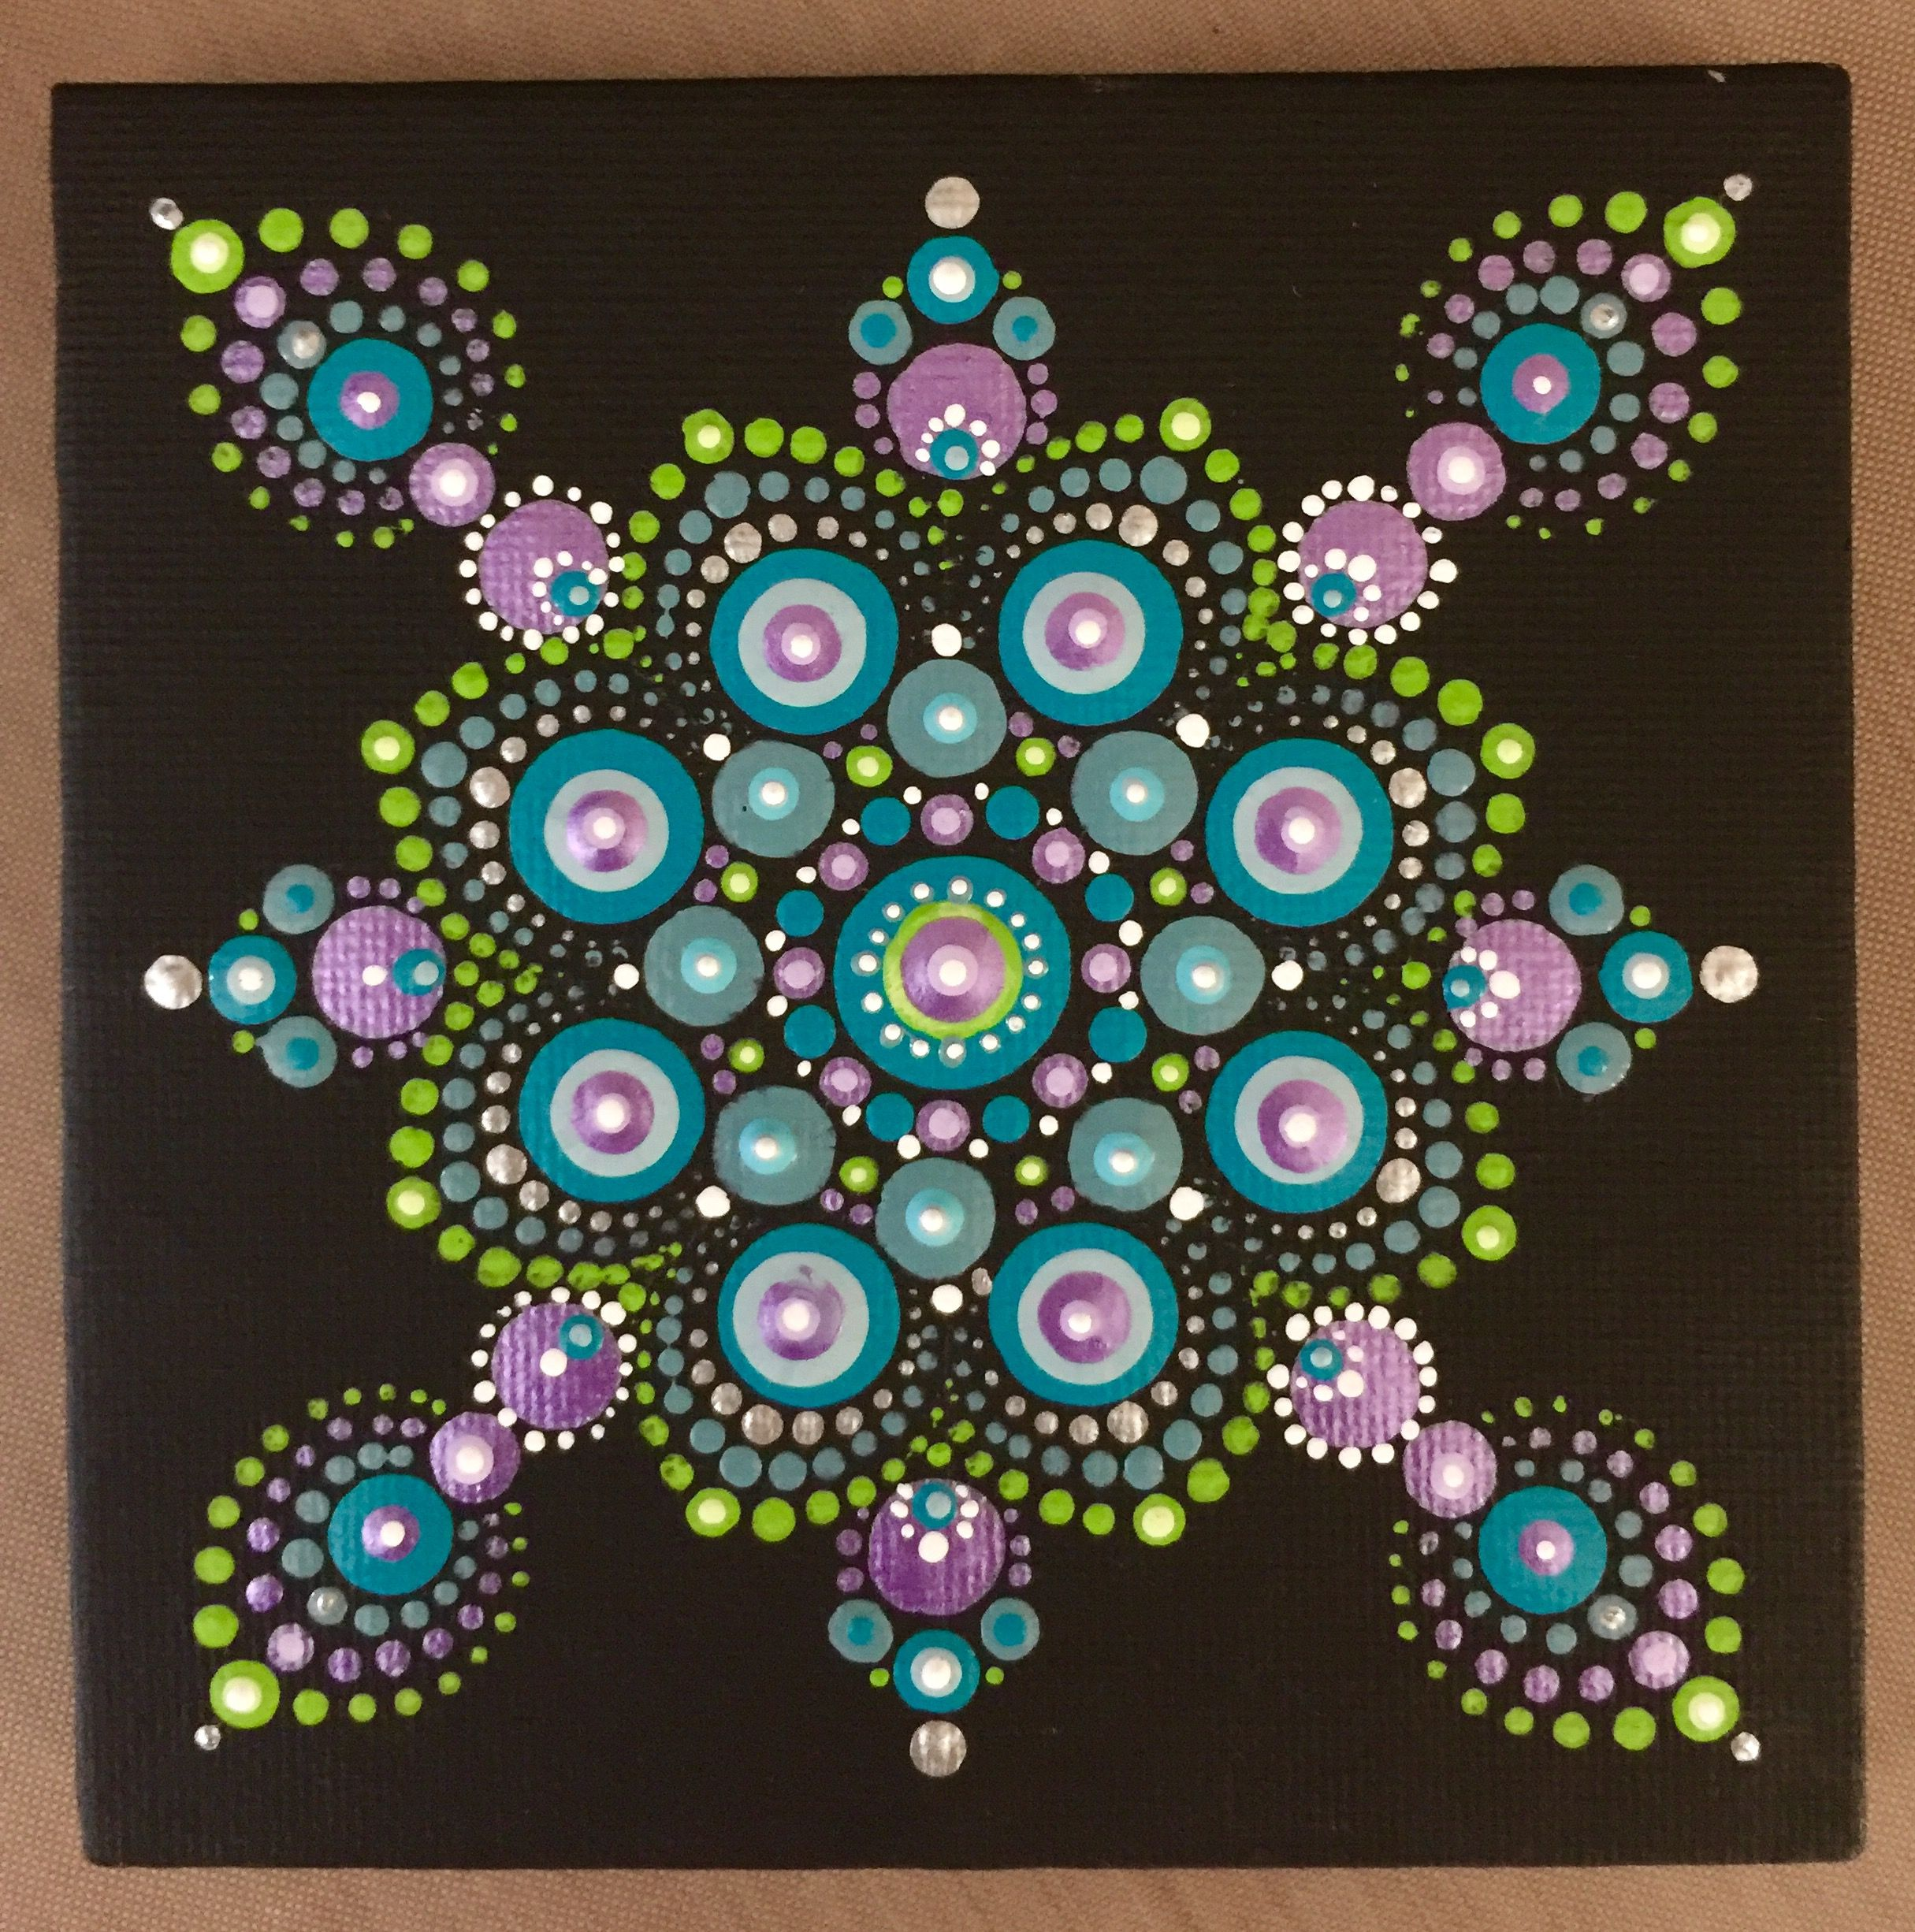 Peacock Dot Mandala Patterns - Year of Clean Water